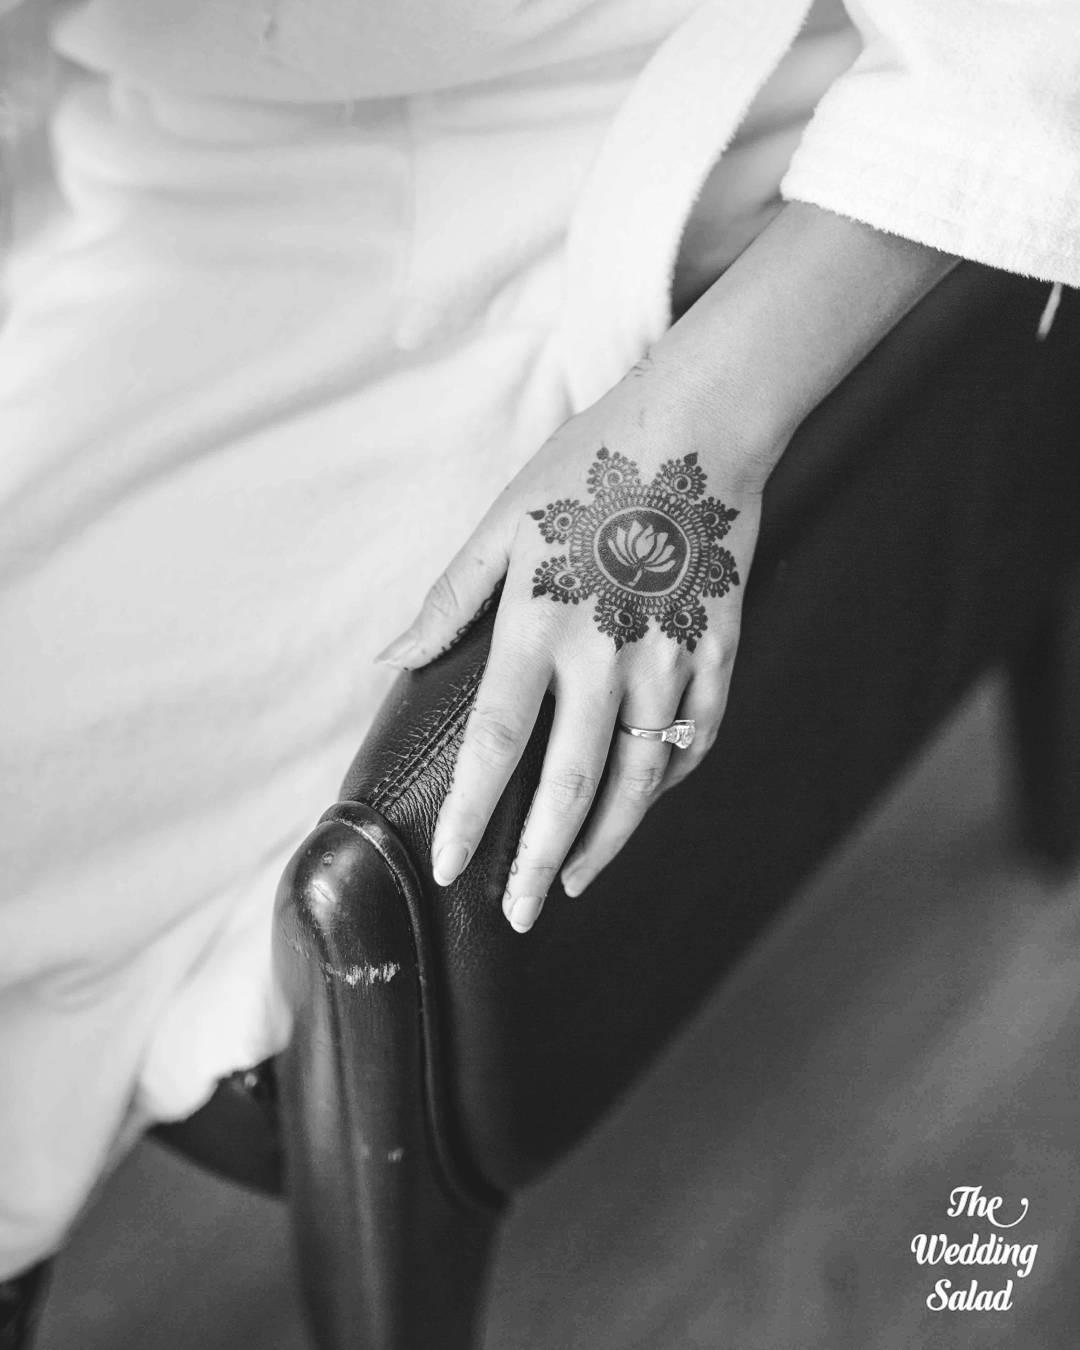 Bridal mehndi designs back side- Simple circular mehndi design for brides